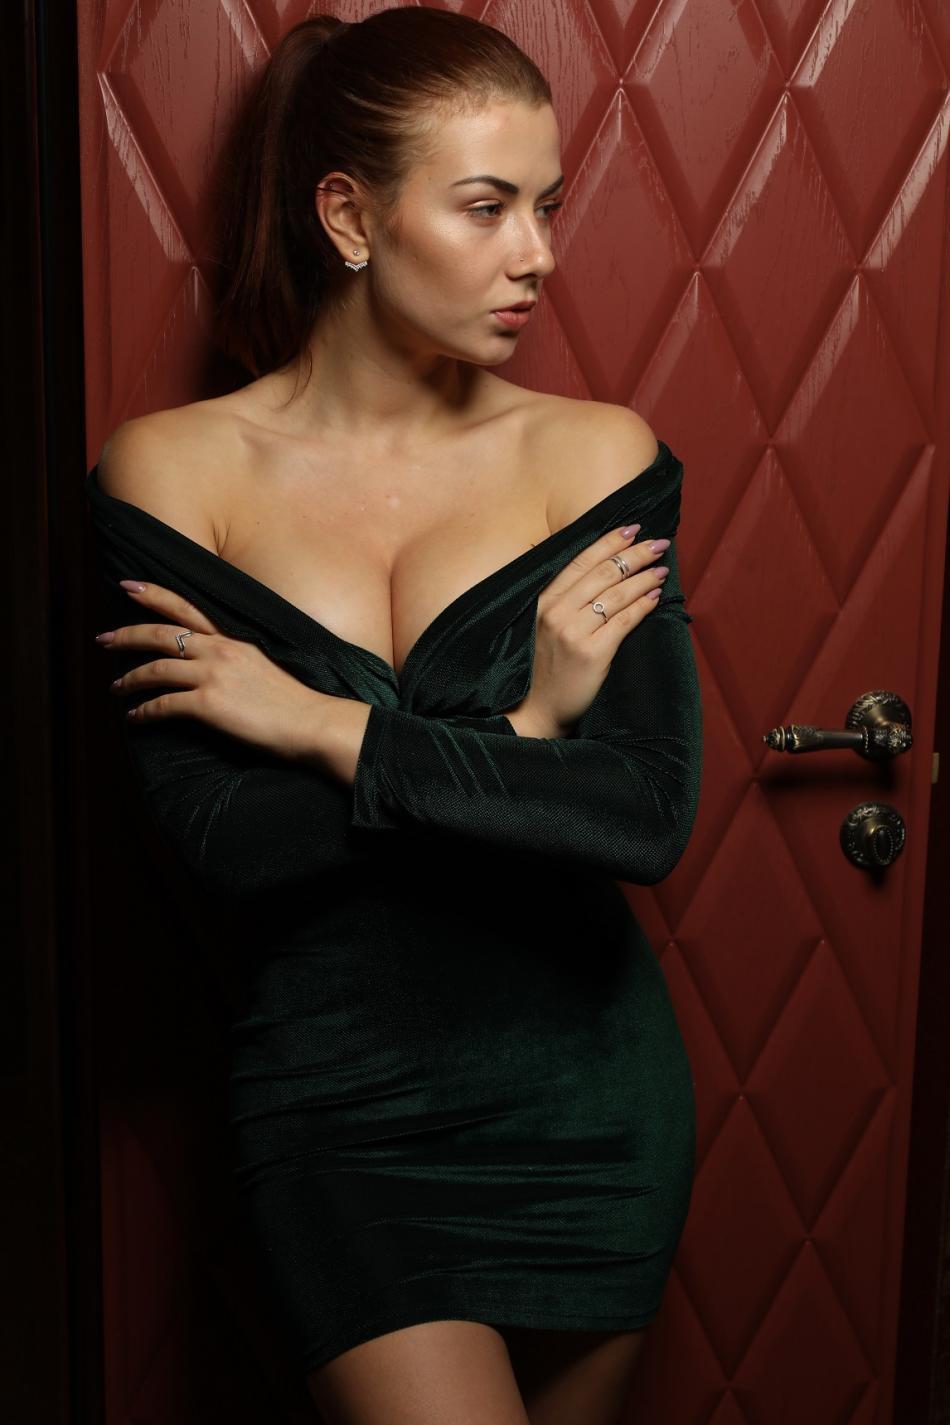 Ladyfordaddy.com Aliya Girl In New York 24064420 - 3 3